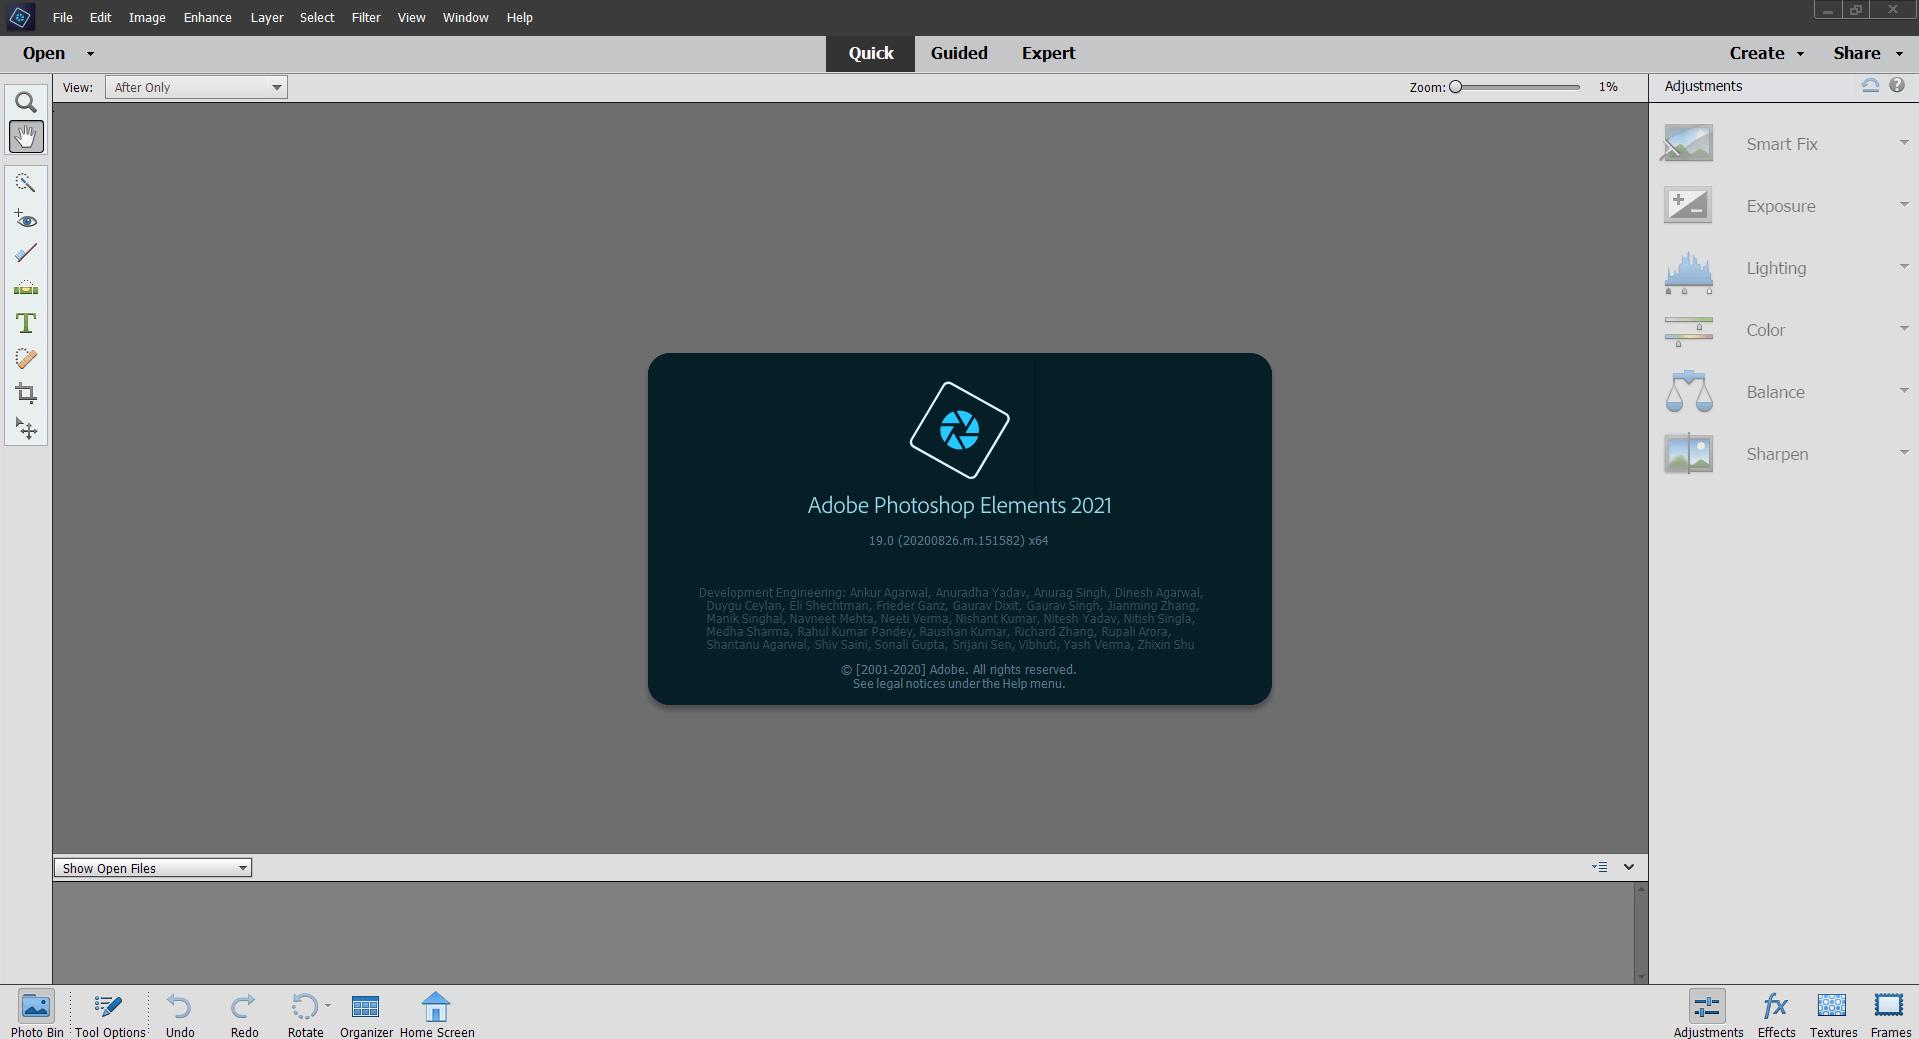 Adobe Photoshop Elements界面